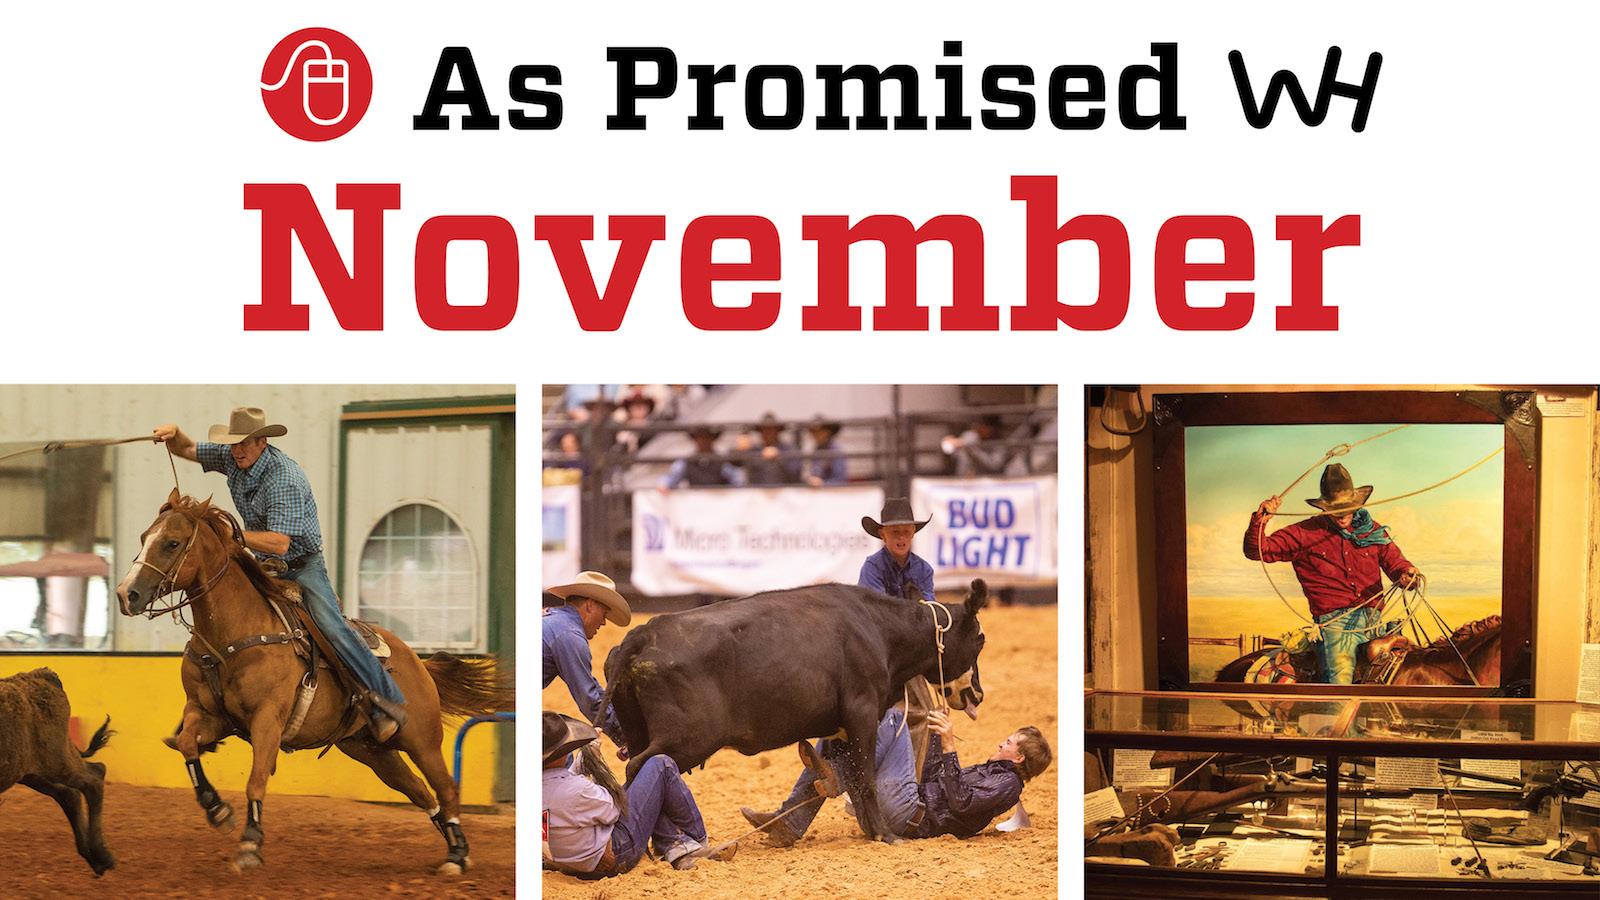 November 2020 Western Horseman promised online content